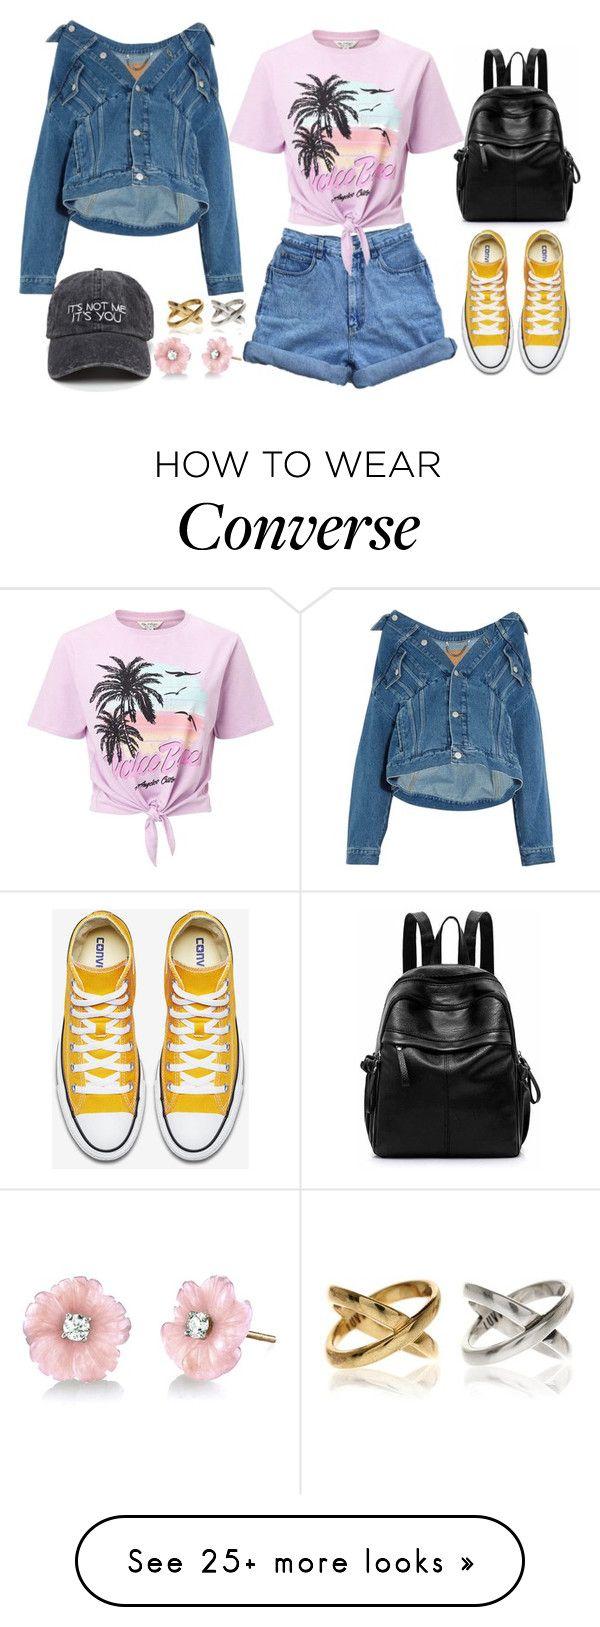 """Dress Up a T-Shirt"" by joslynaurora on Polyvore featuring Miss Selfridge, Balenciaga, Irene Neuwirth and MyFaveTshirt"